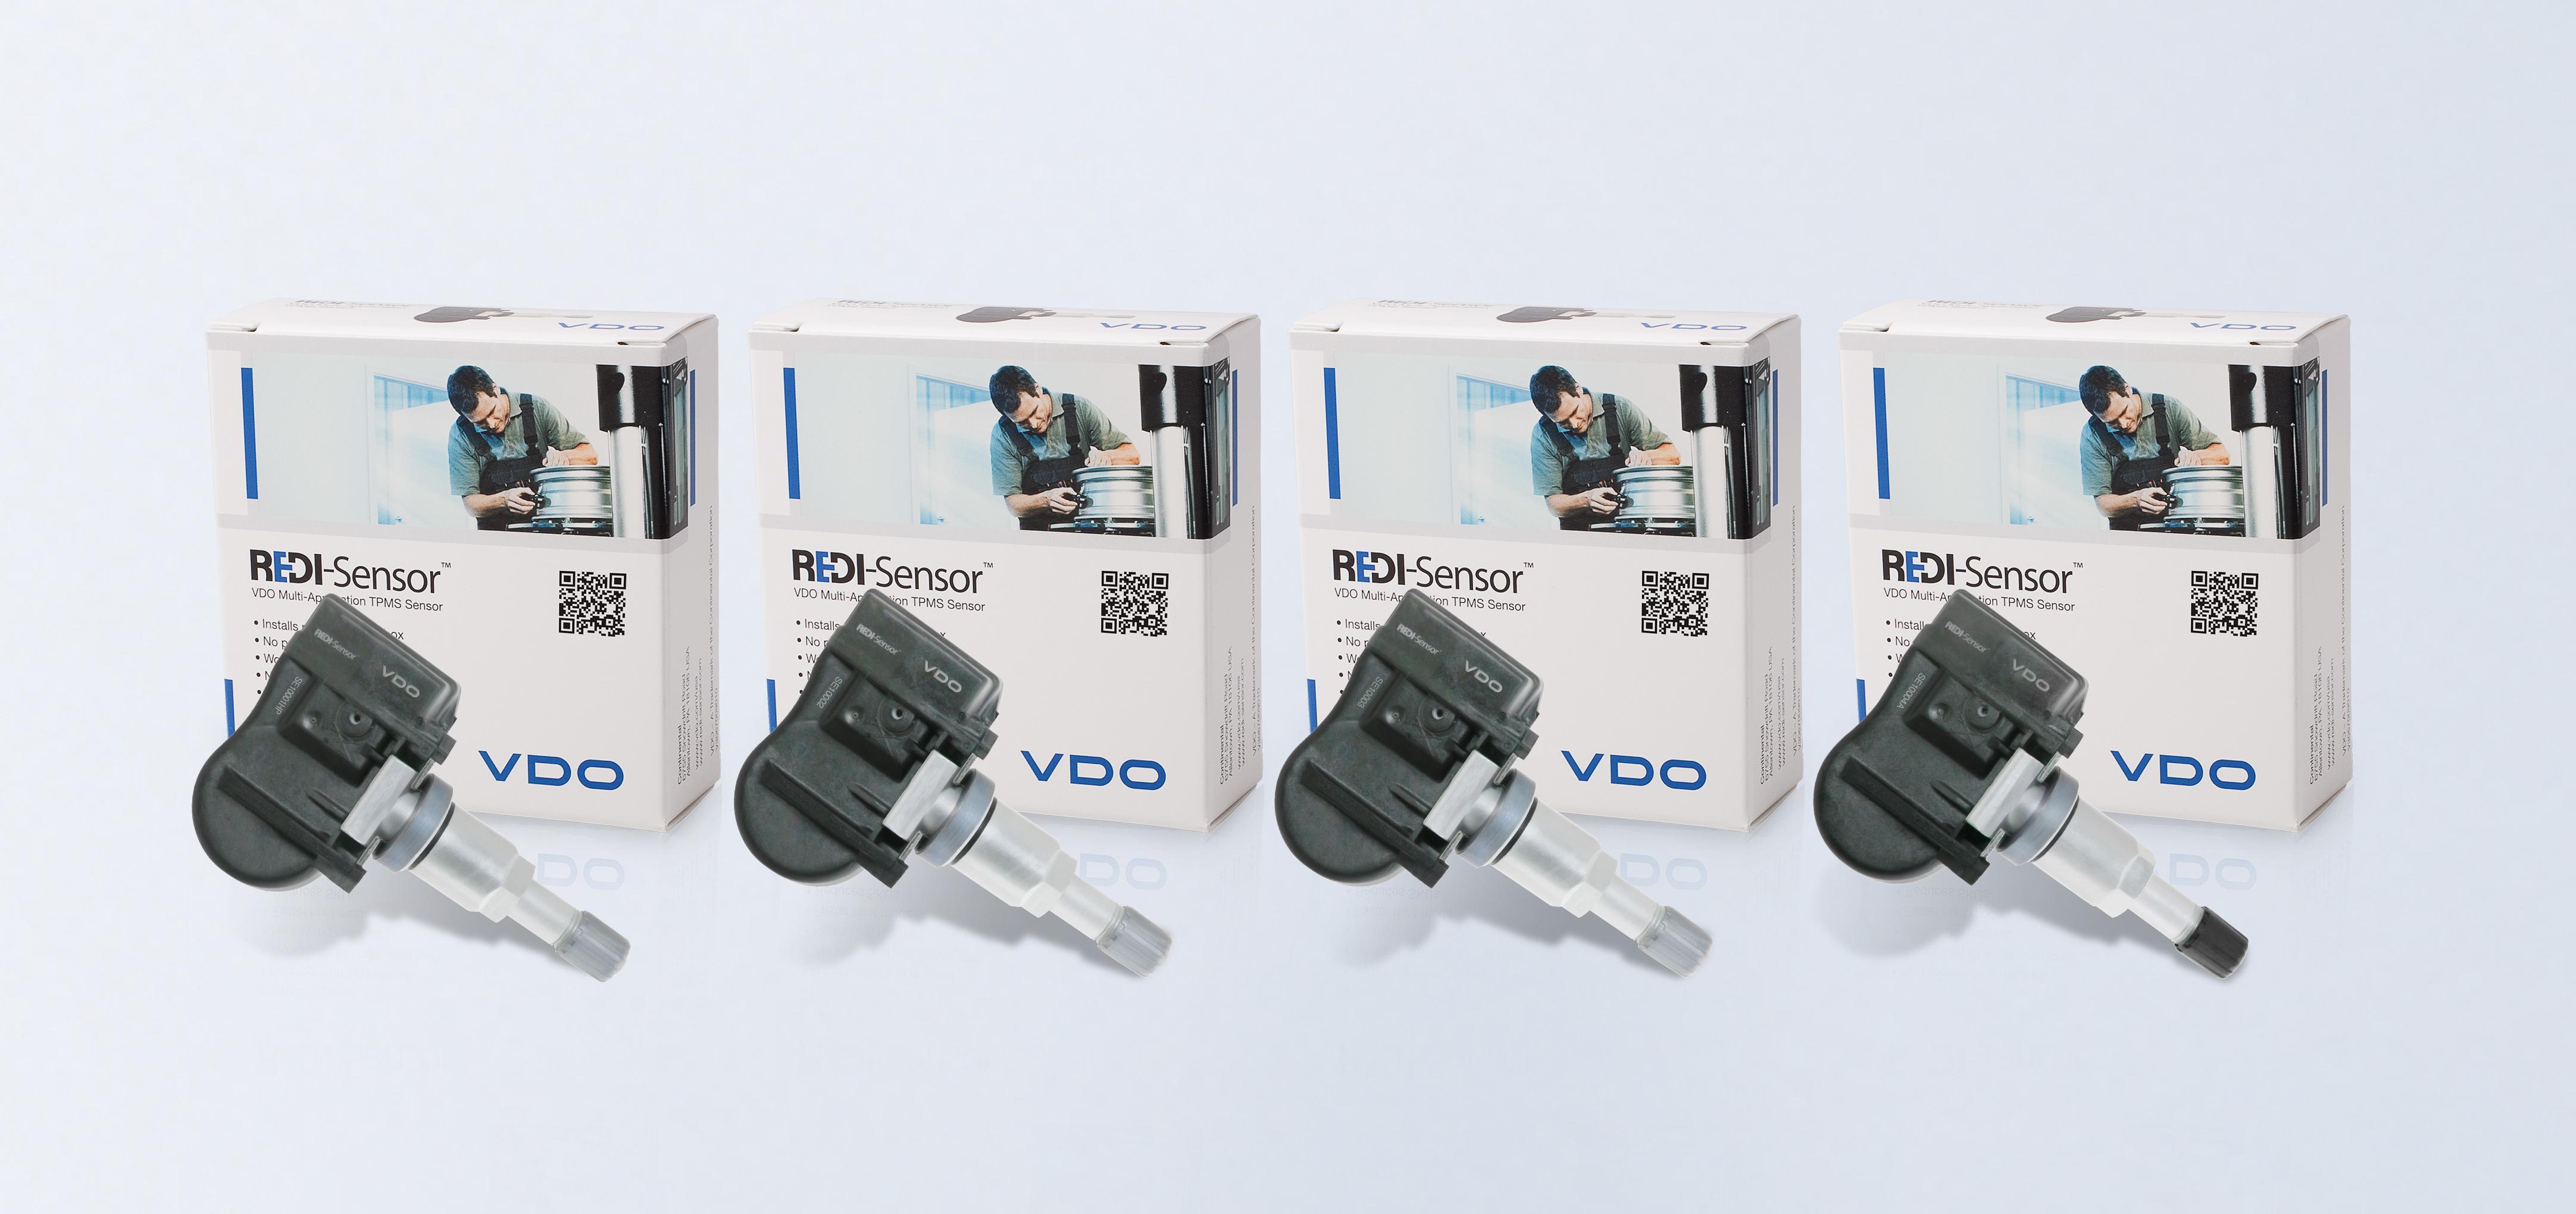 REDI_Sensor_TPMS_Sensors_with_pkg_13